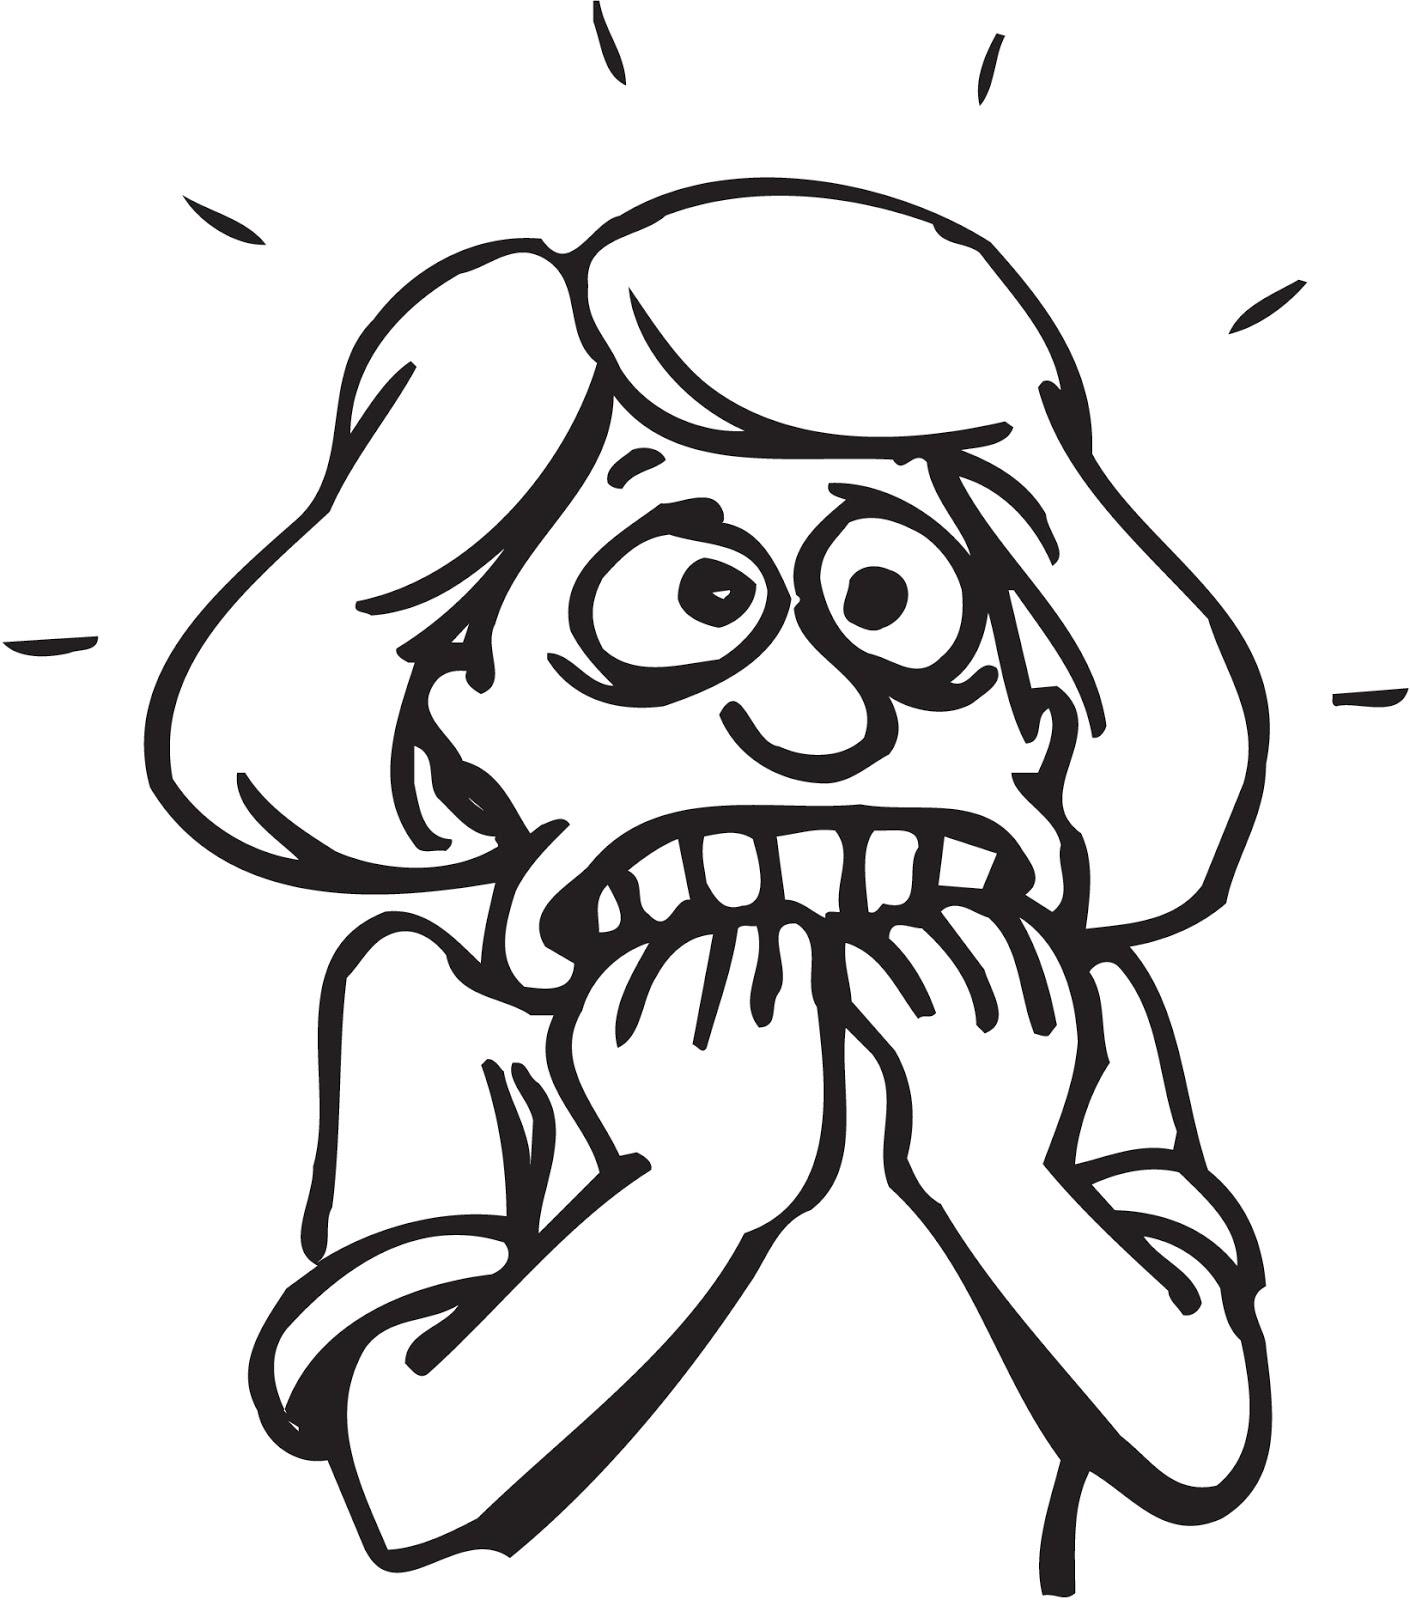 1410x1600 Scary Cartoon Drawings Draw Scared Anime Face Scary Cartoon